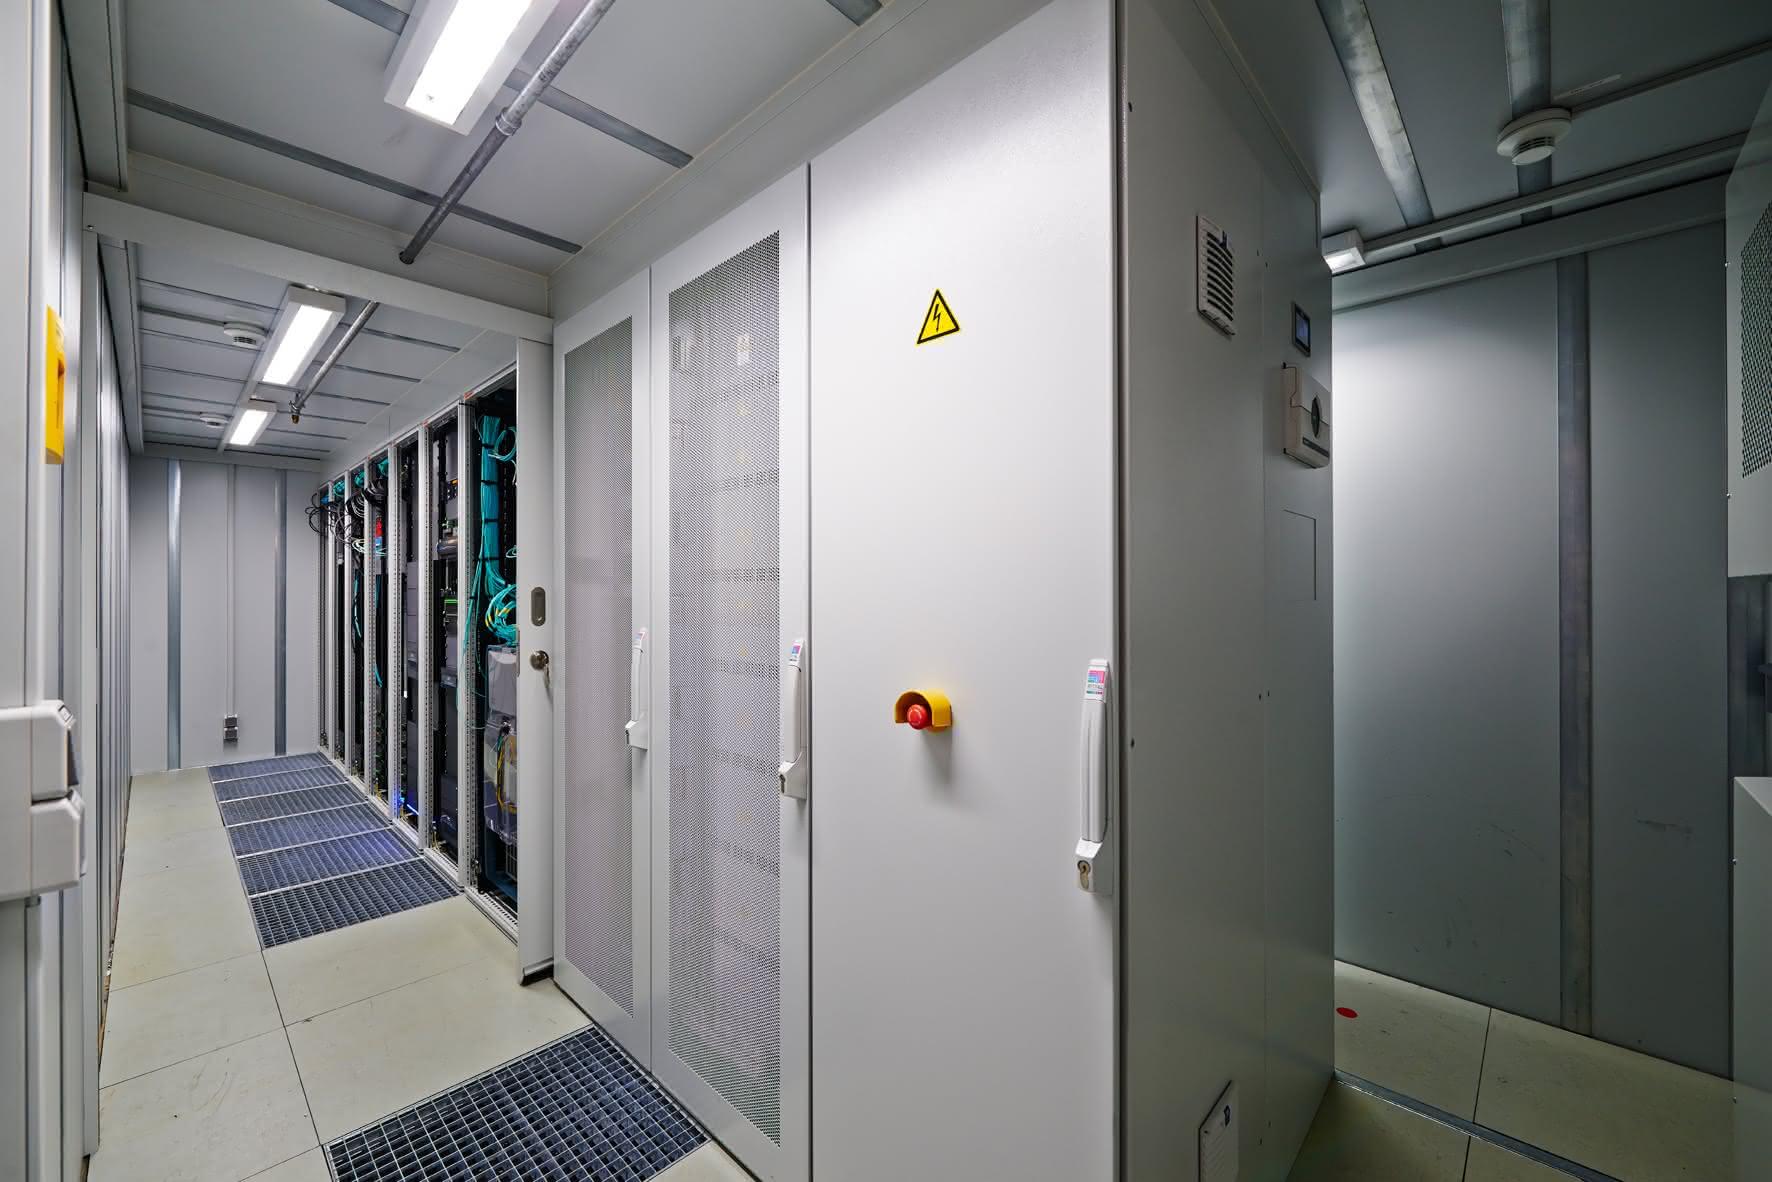 TÜV bestätigt Rittal Energieeffizienz: Dicht am Bestwert